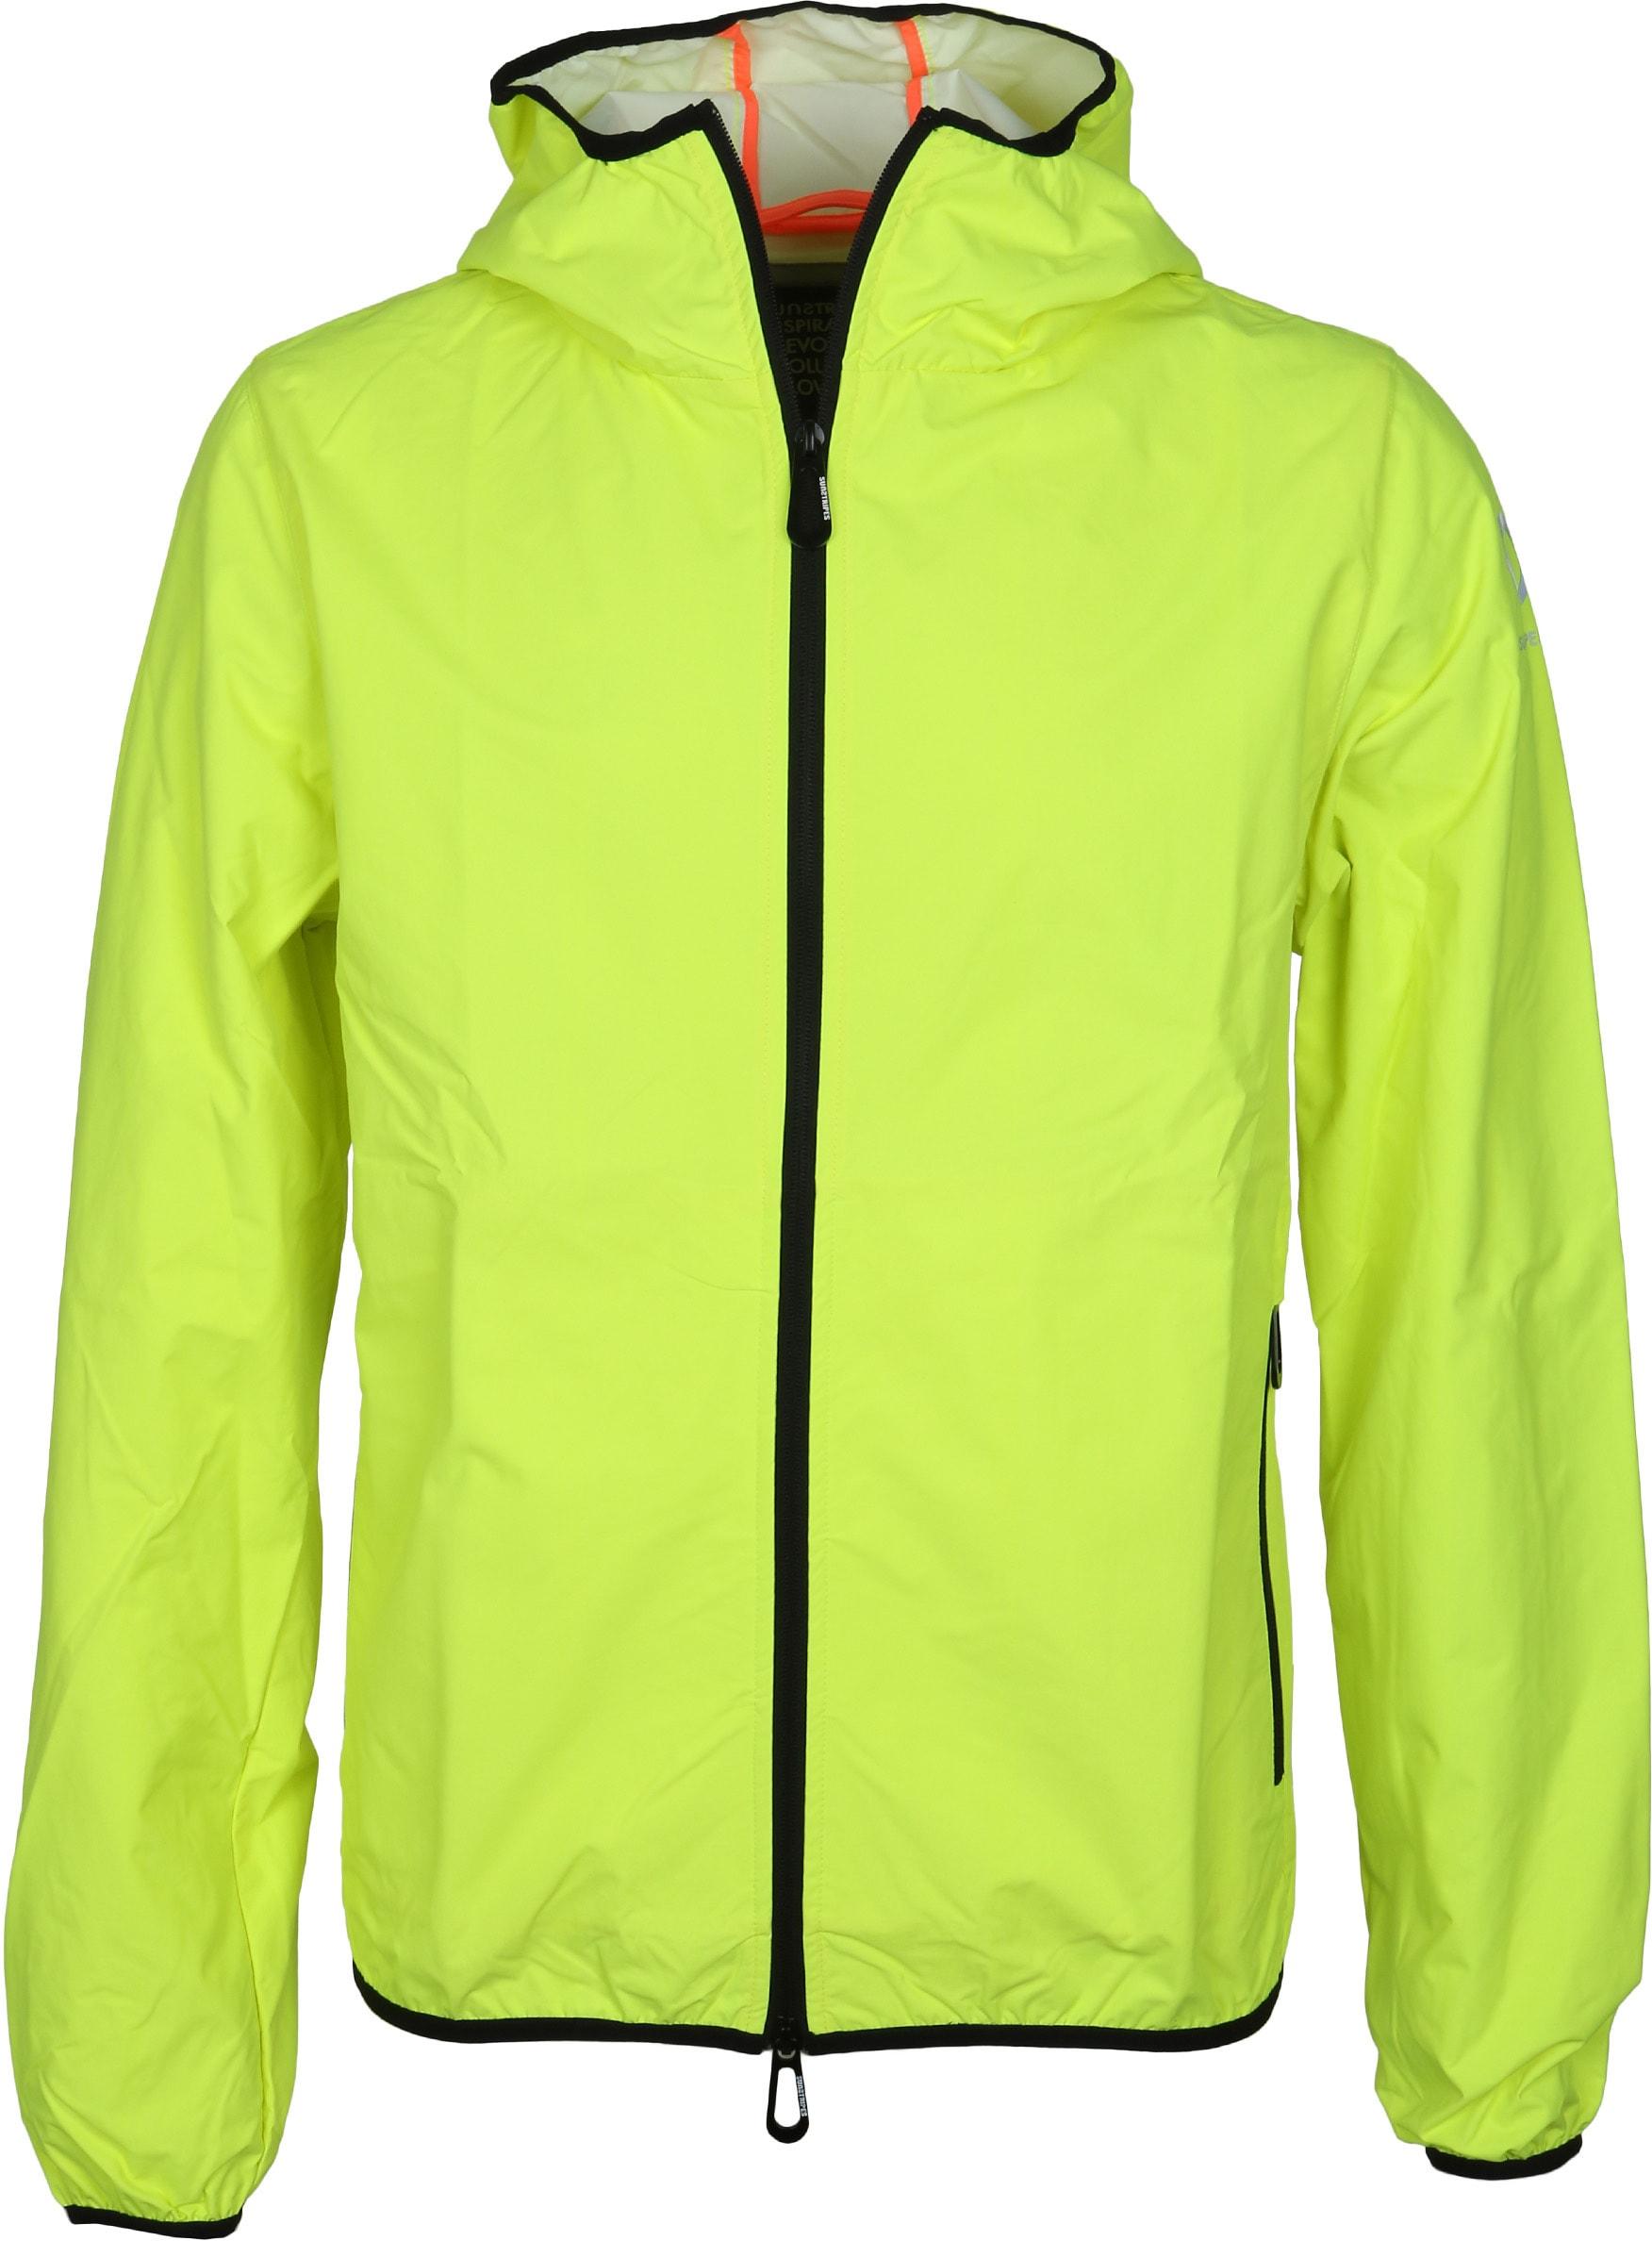 Jacket Bonatti Neongelb Jacke Sunstripes Yellow nwO0Pk